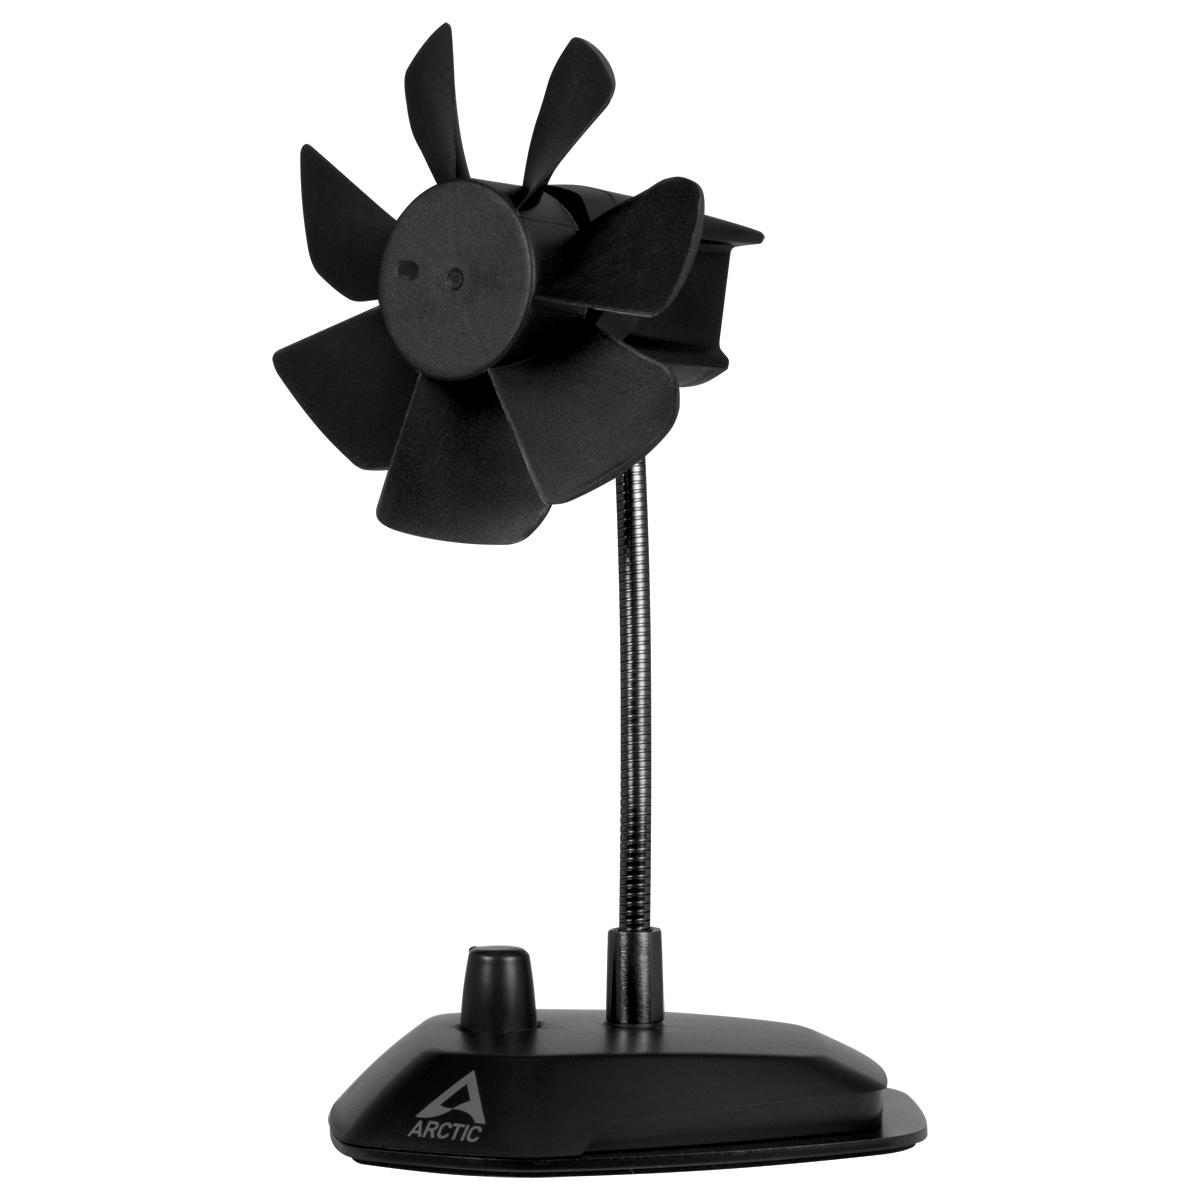 ARCTIC Breeze Color Edition BLACK - USB desktop fan - ABACO-BRZBK01-BL